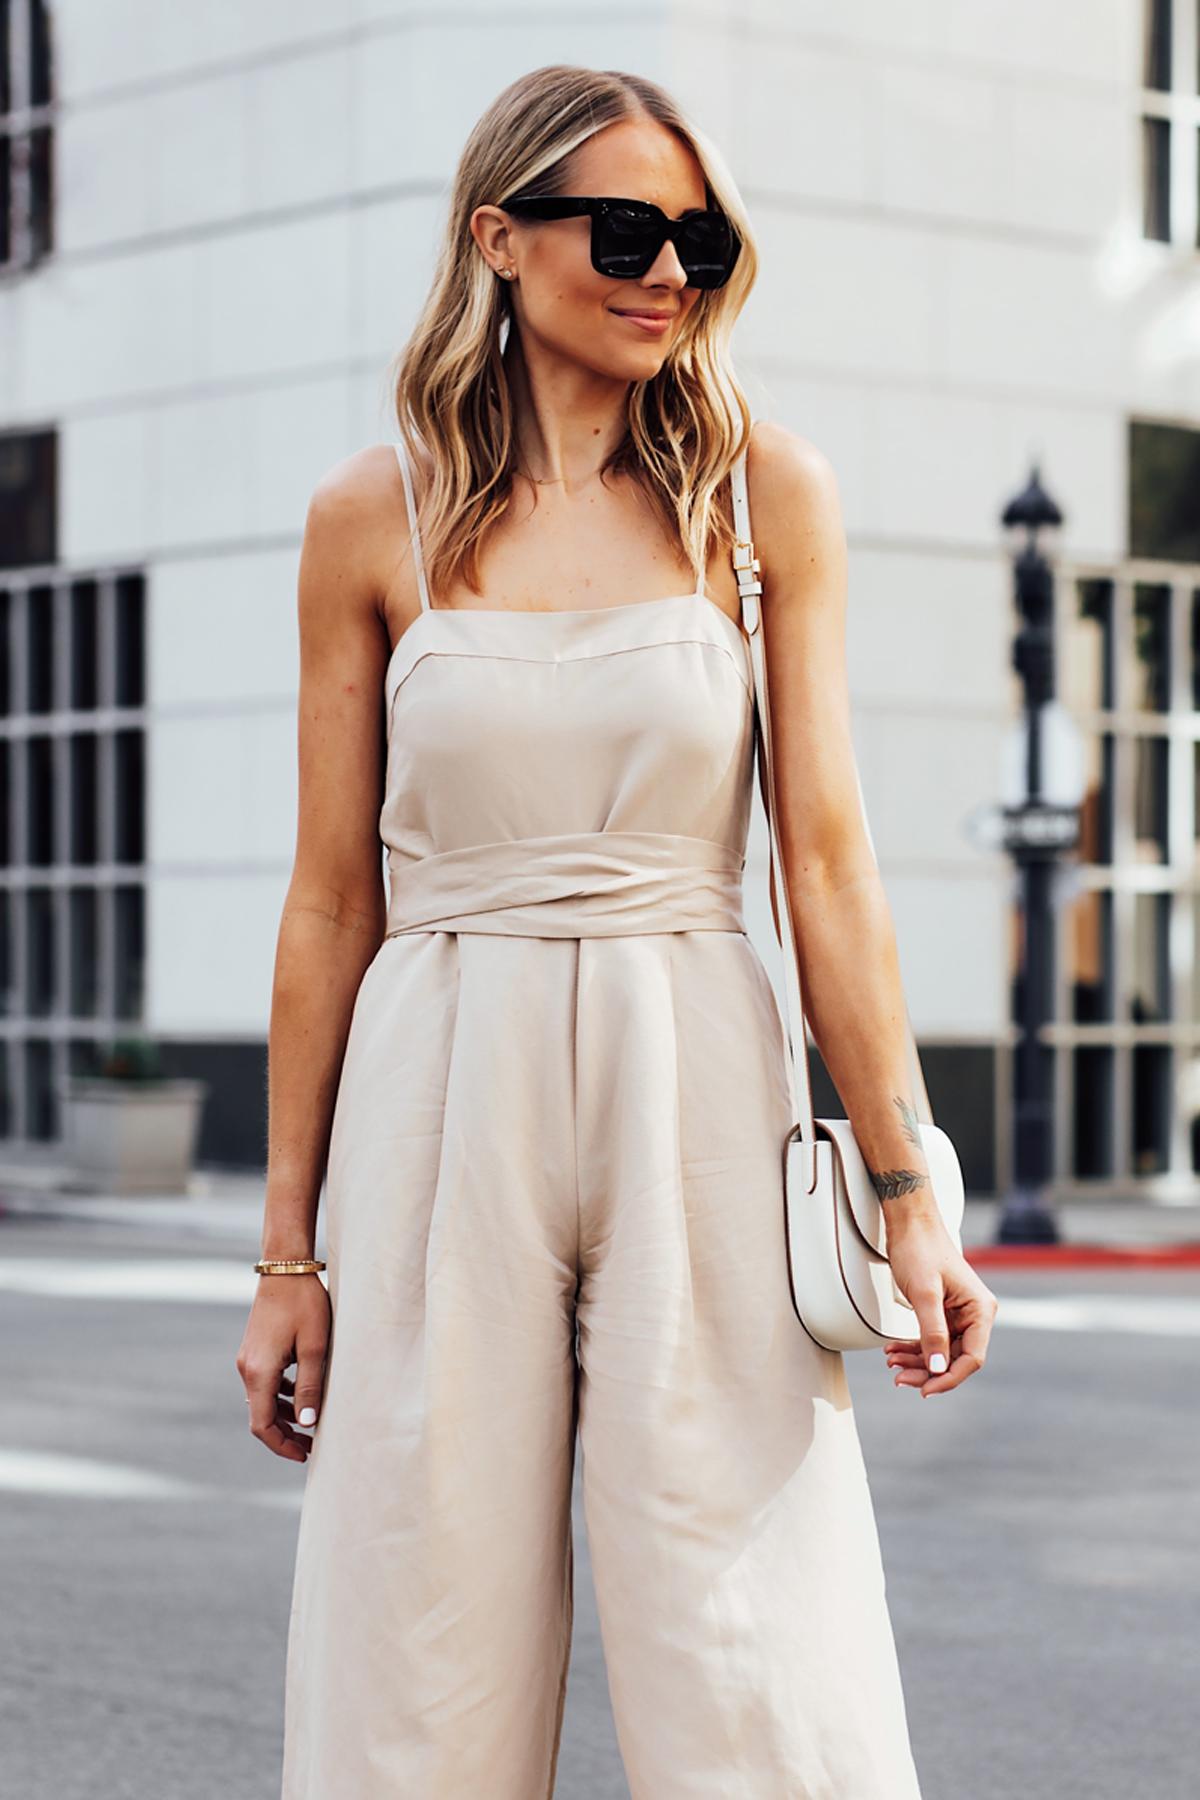 Blonde Woman Wearing Banana Republic Beige Linen Jumpsuit White Handbag Fashion Jackson San Diego Fashion Blogger Street Style